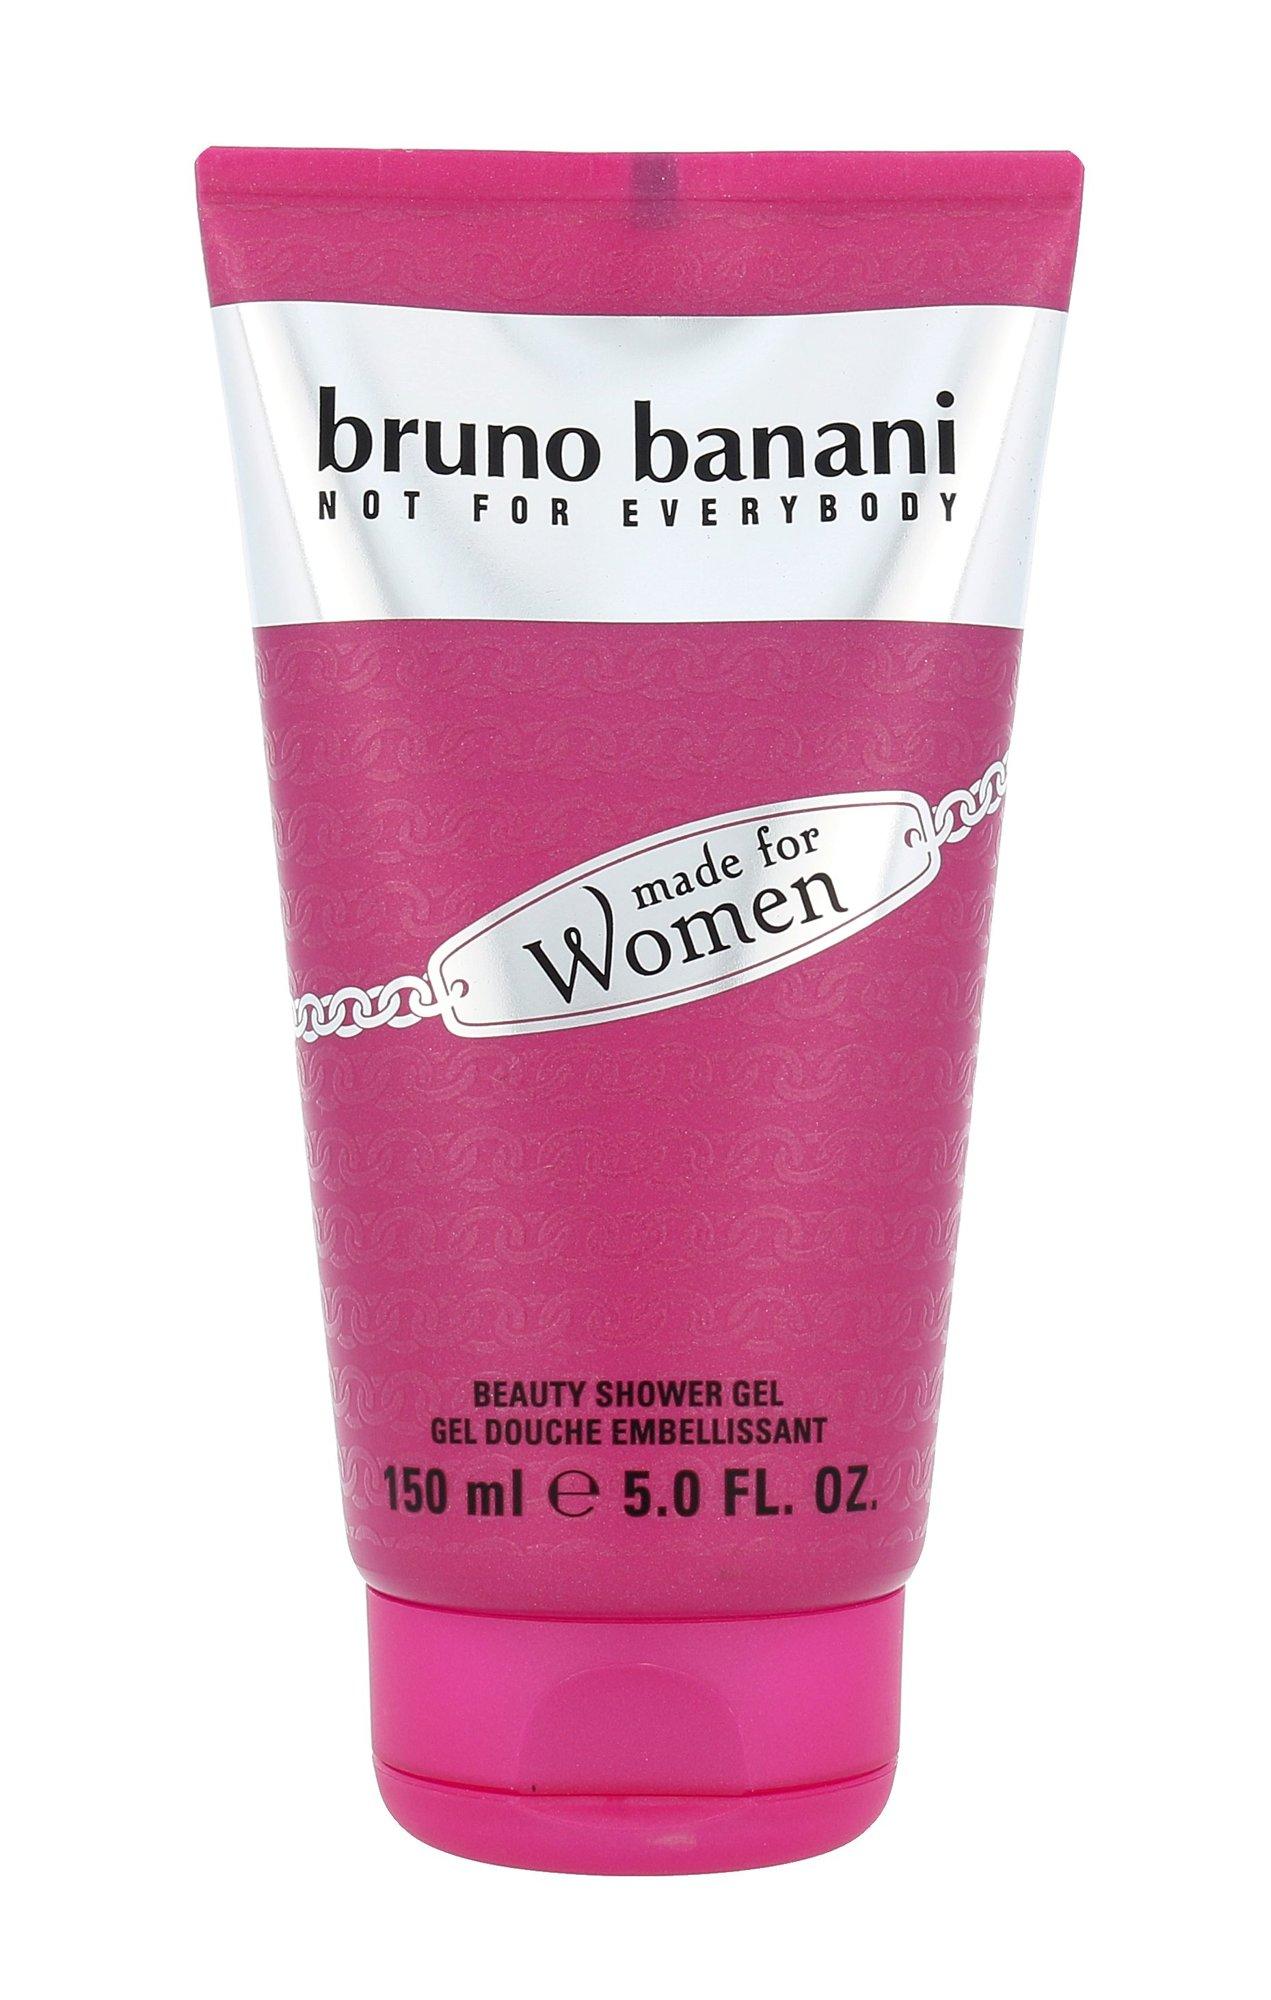 Bruno Banani Made for Woman Shower gel 150ml